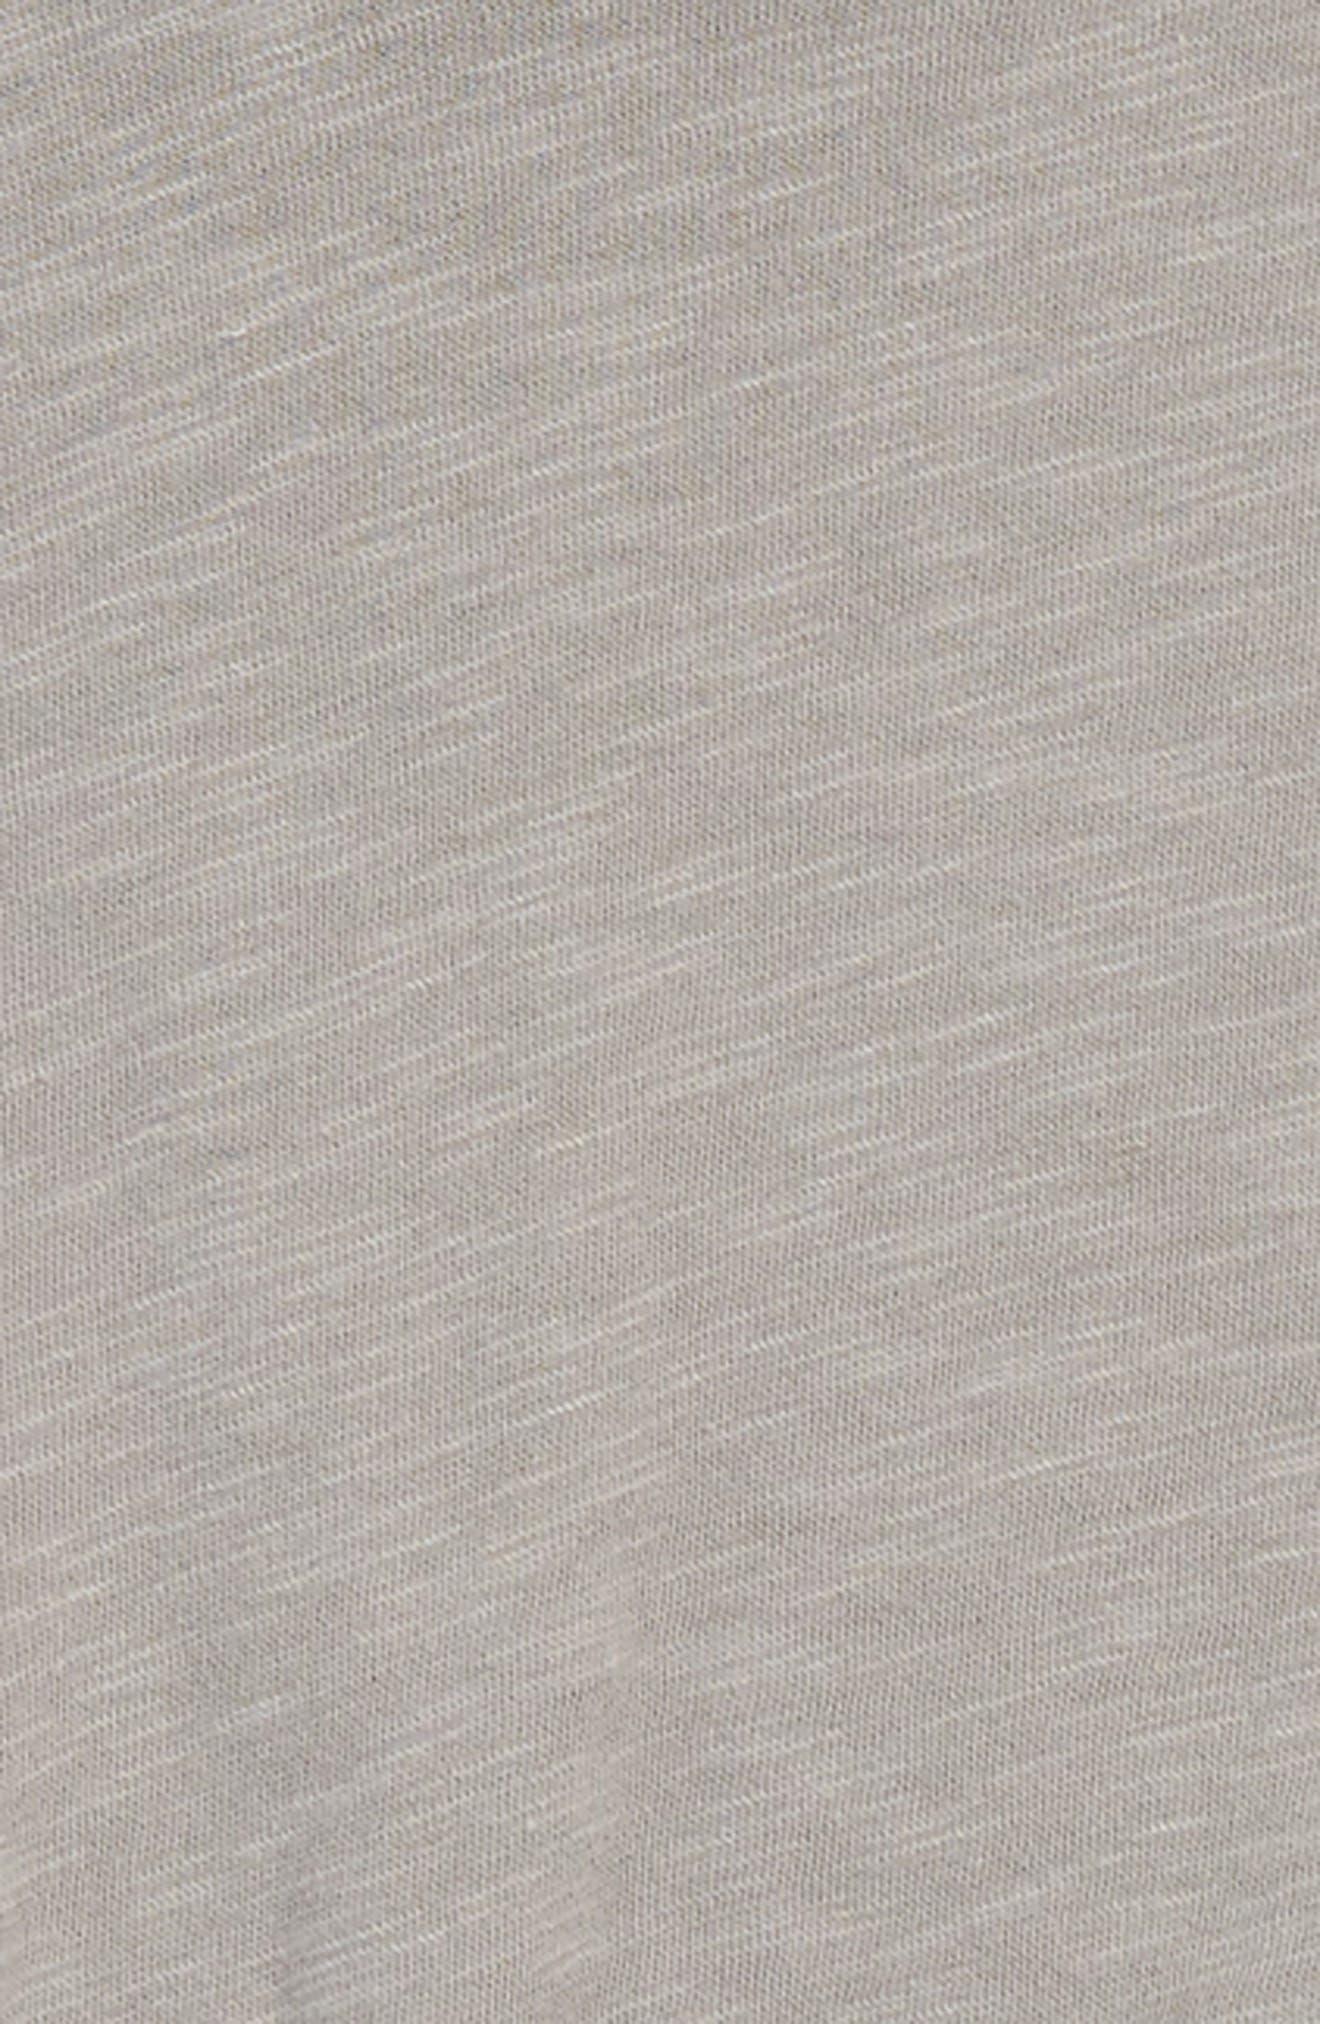 Knotted Ringer Tee,                             Alternate thumbnail 2, color,                             Grey Cloudburst